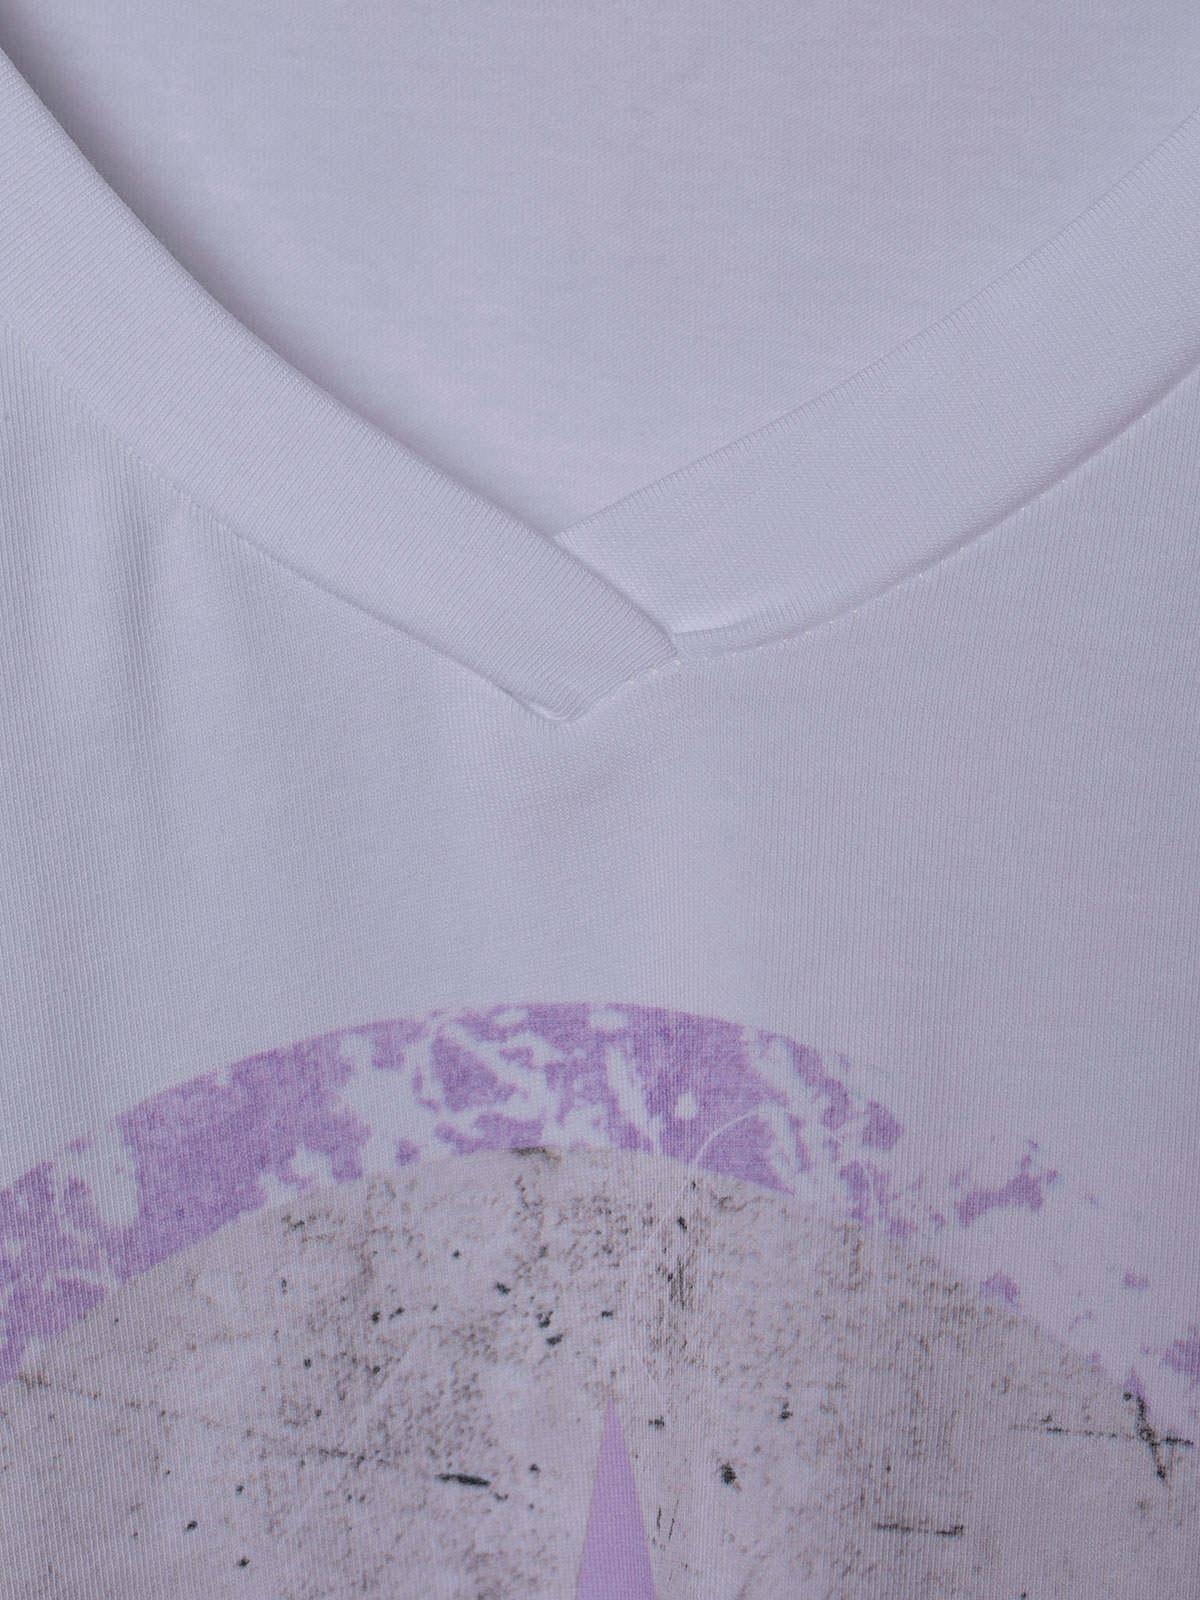 Camiseta mujer oversize estrella algodón orgánico Lila